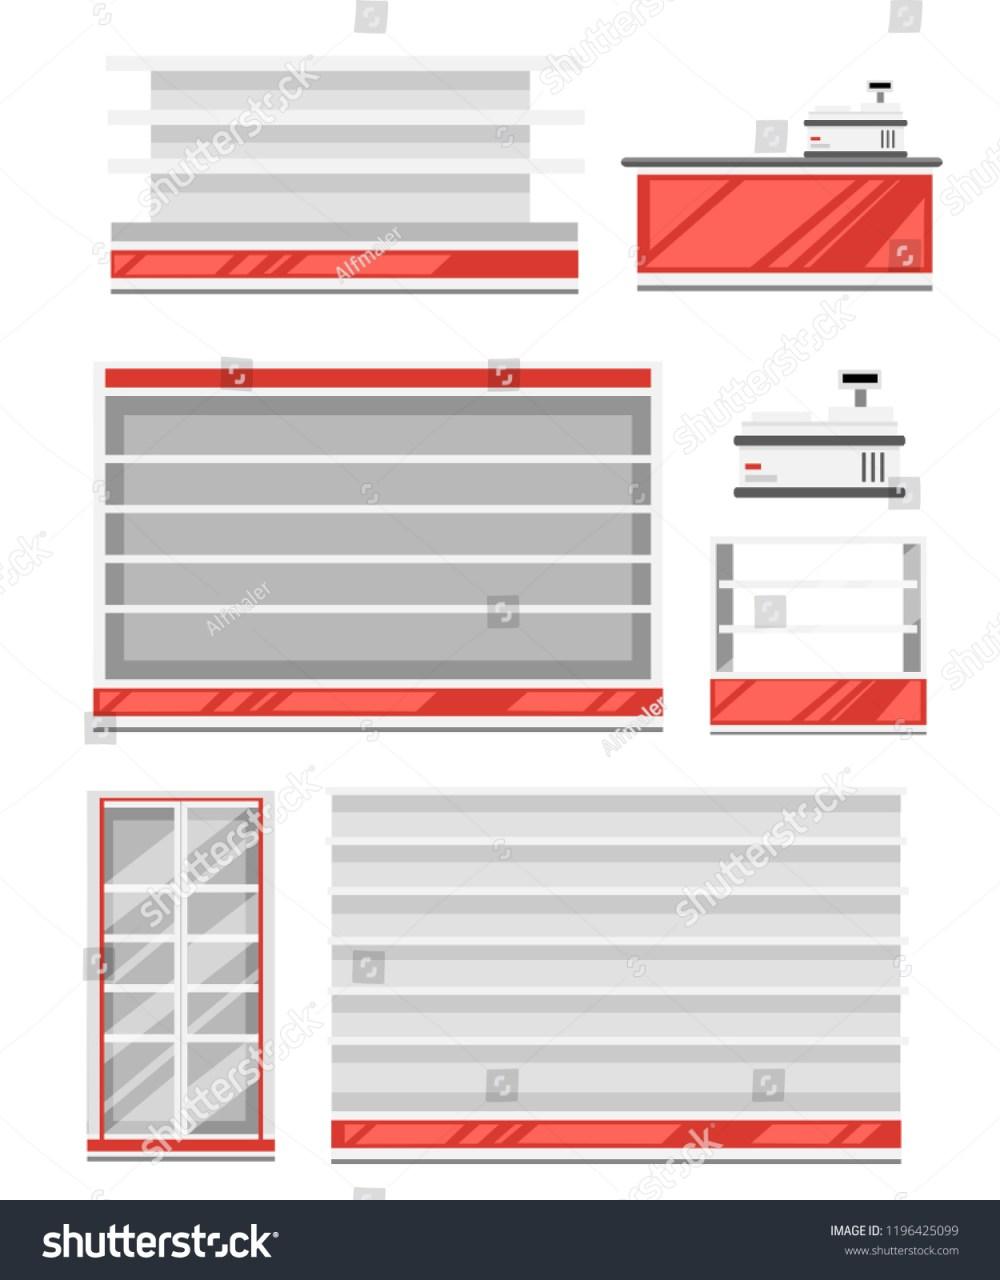 medium resolution of set of supermarket shelves red and white color shelf fridge and cash register